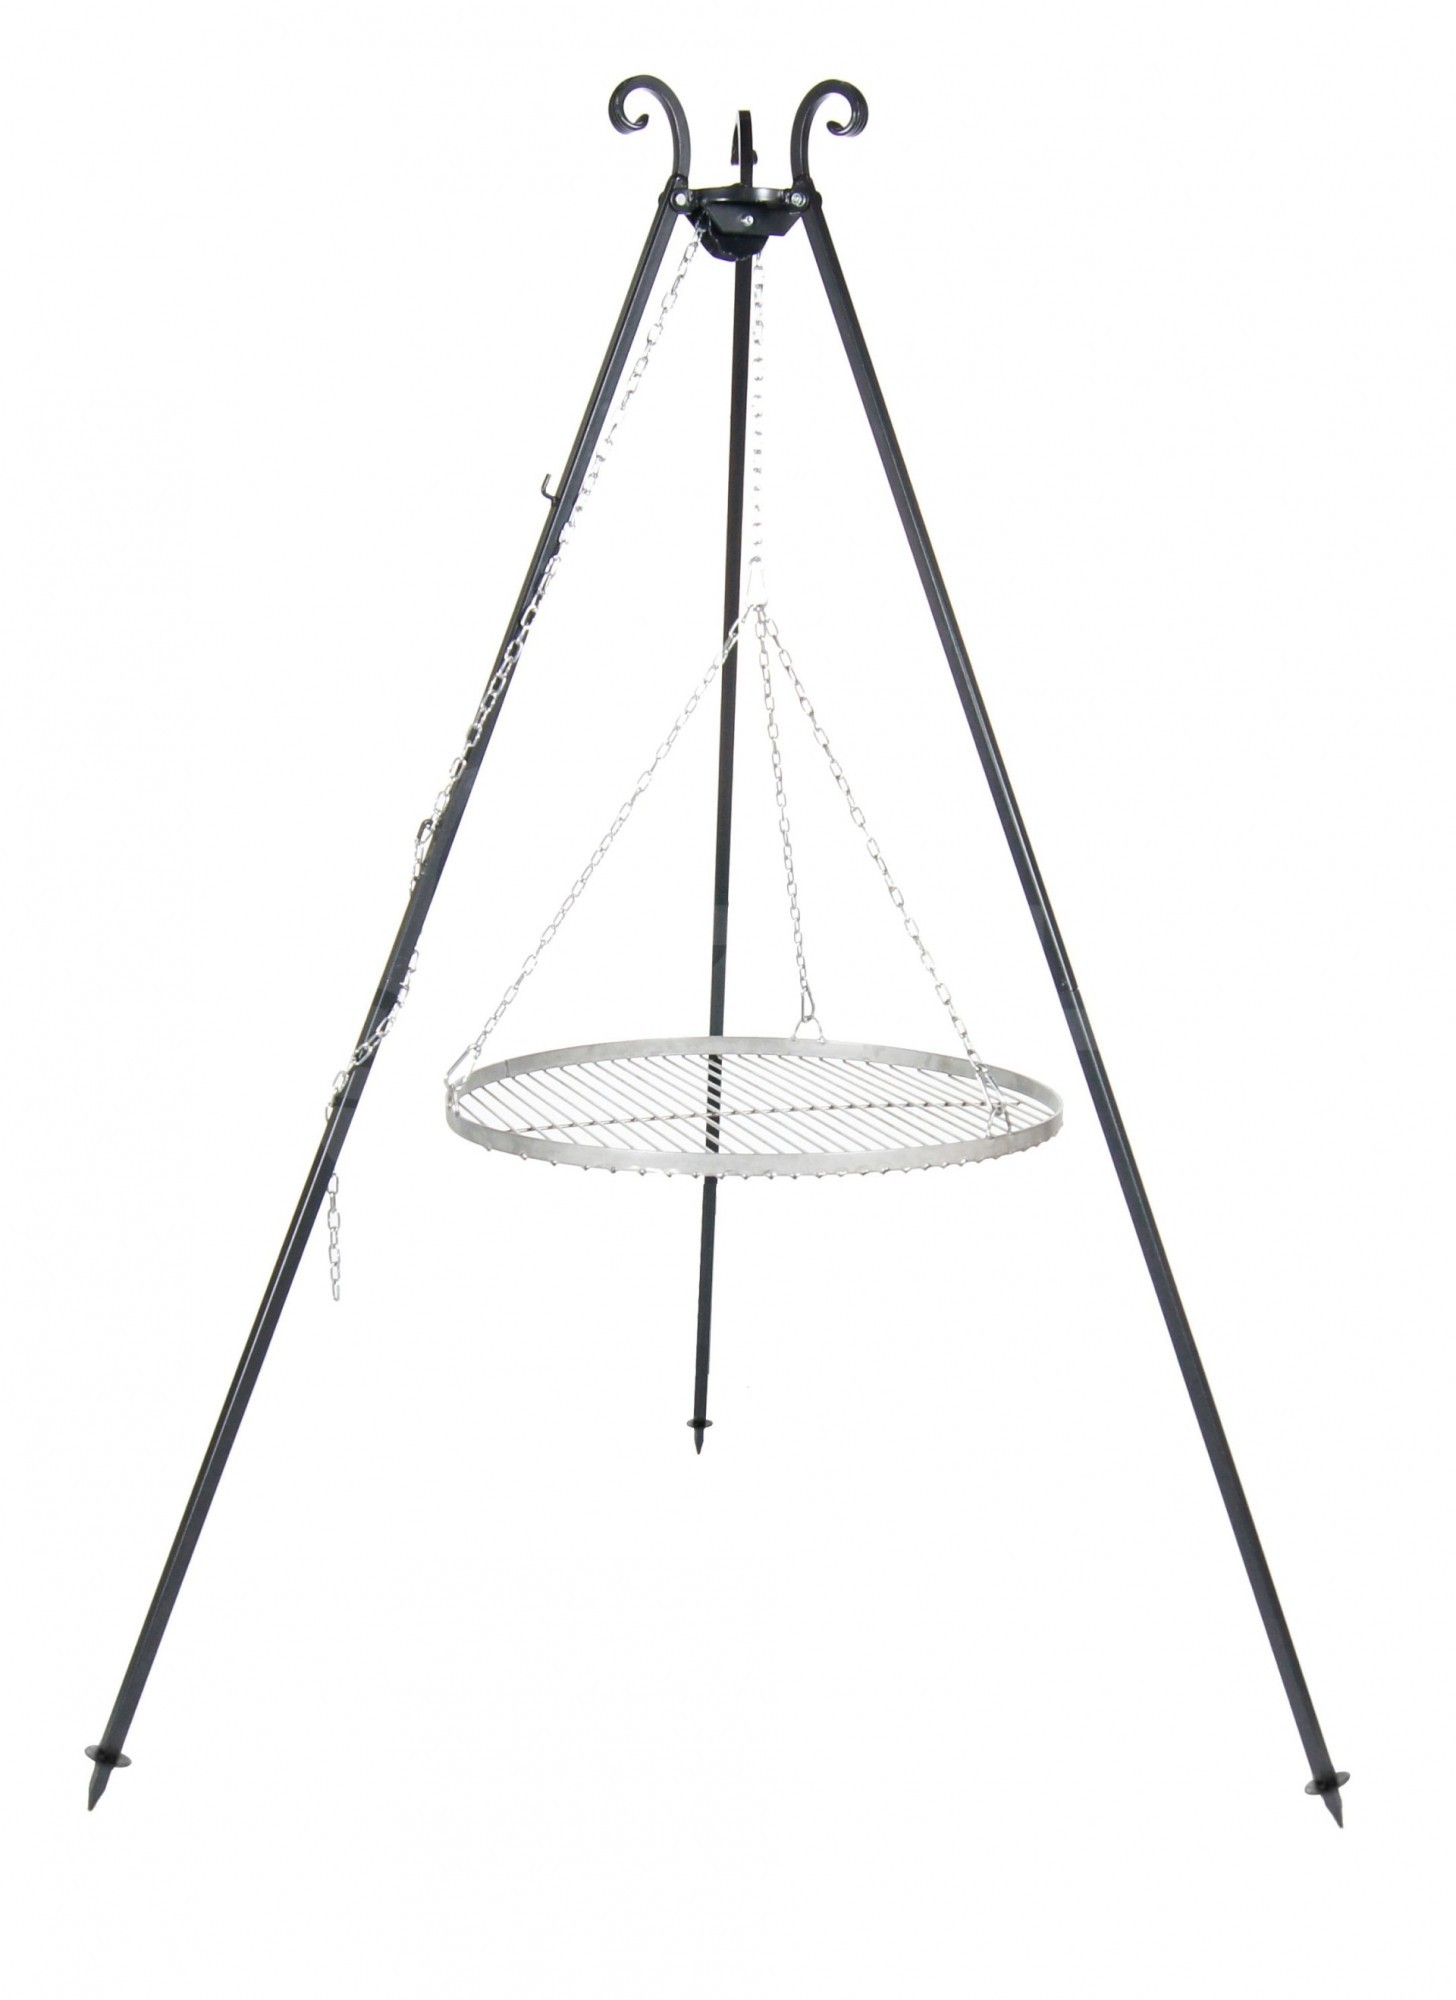 farmcook schwenkgrill viking edelstahl 60 cm kaufen bei. Black Bedroom Furniture Sets. Home Design Ideas